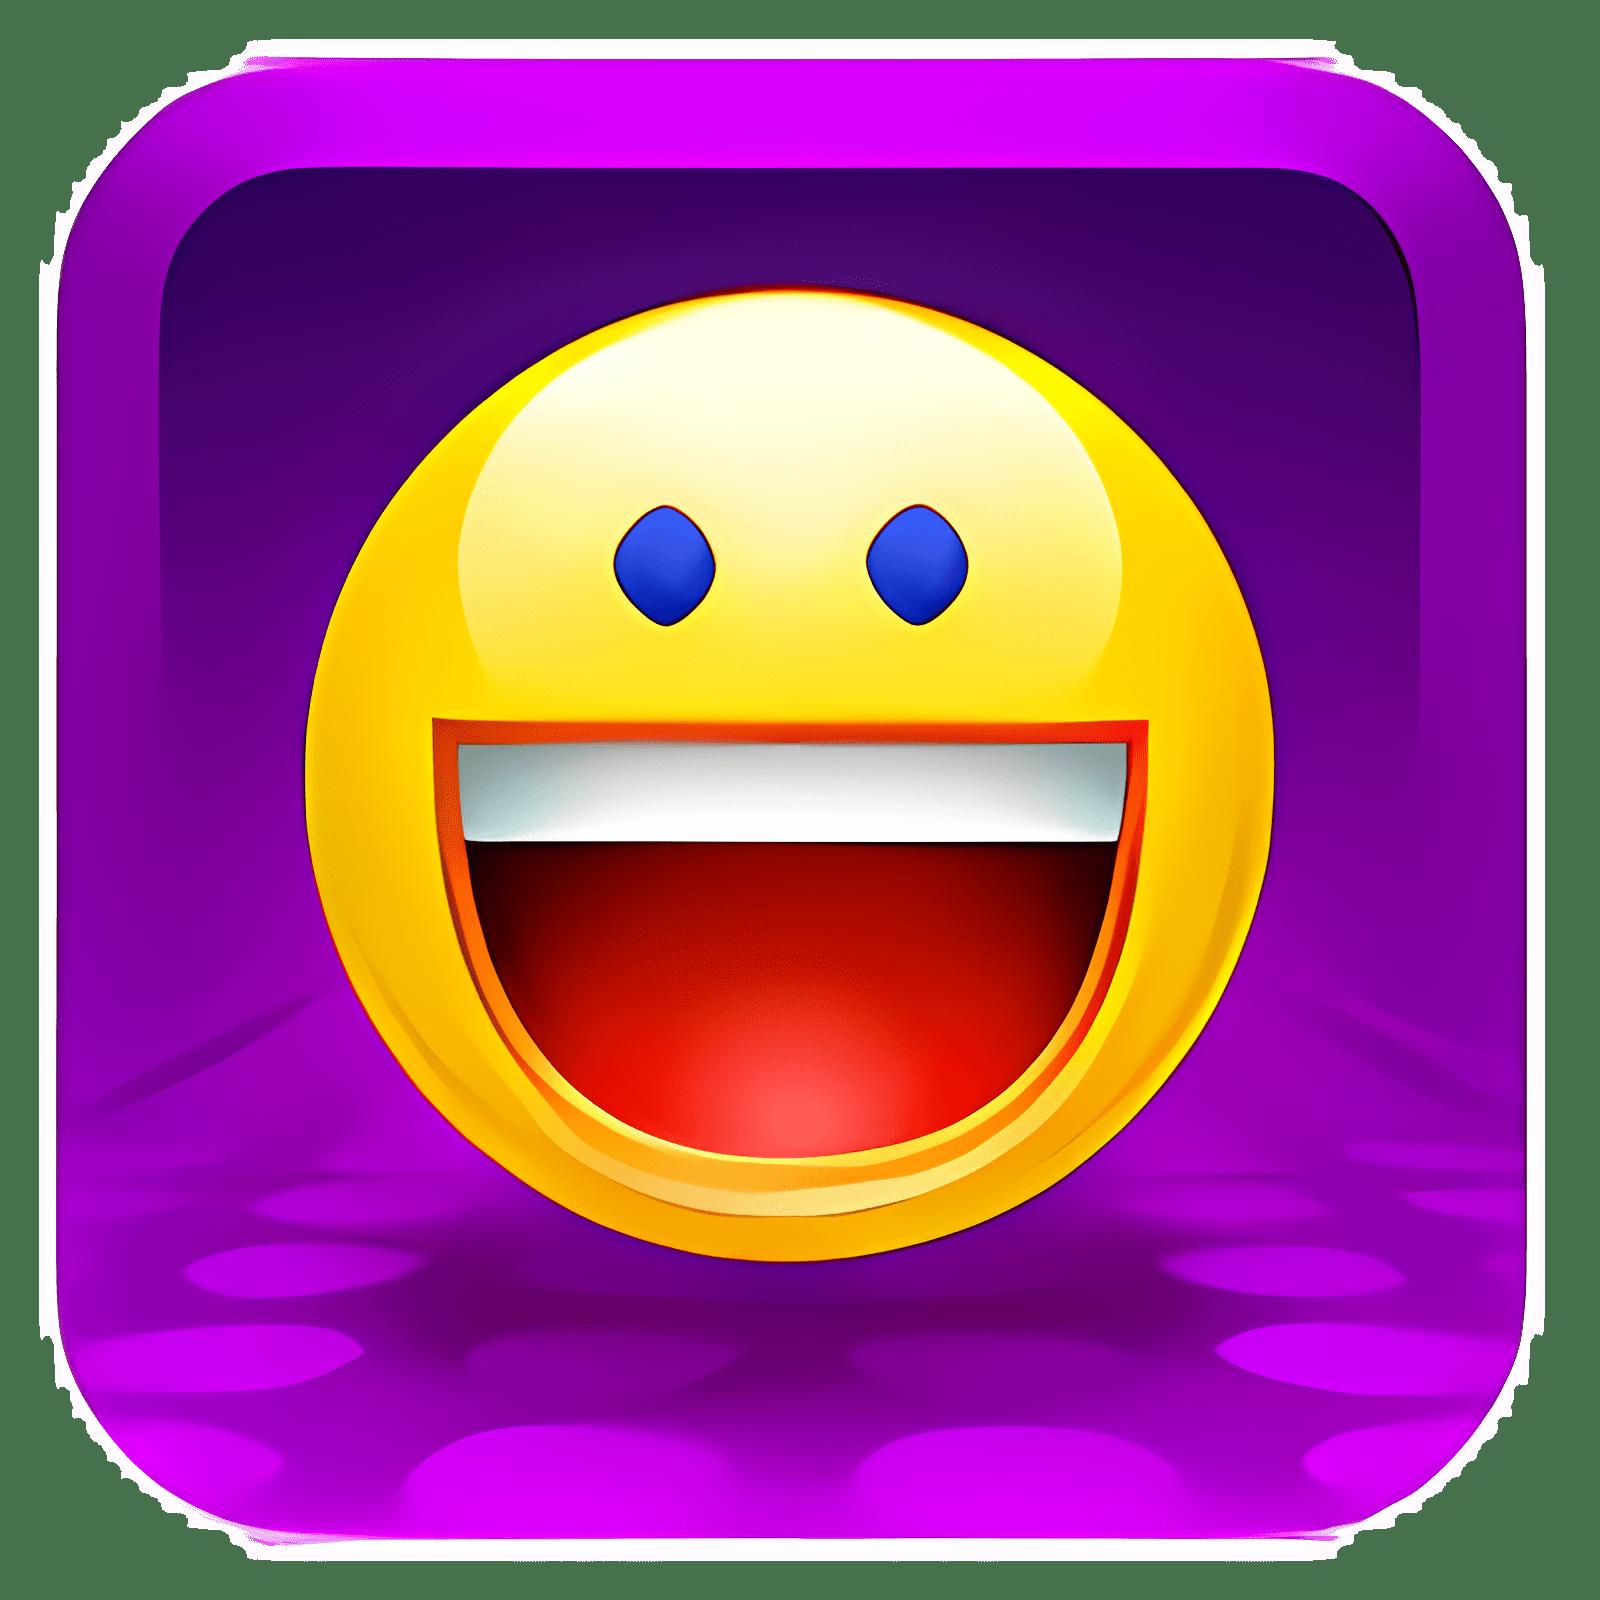 Yahoo! Messenger 2.2.9